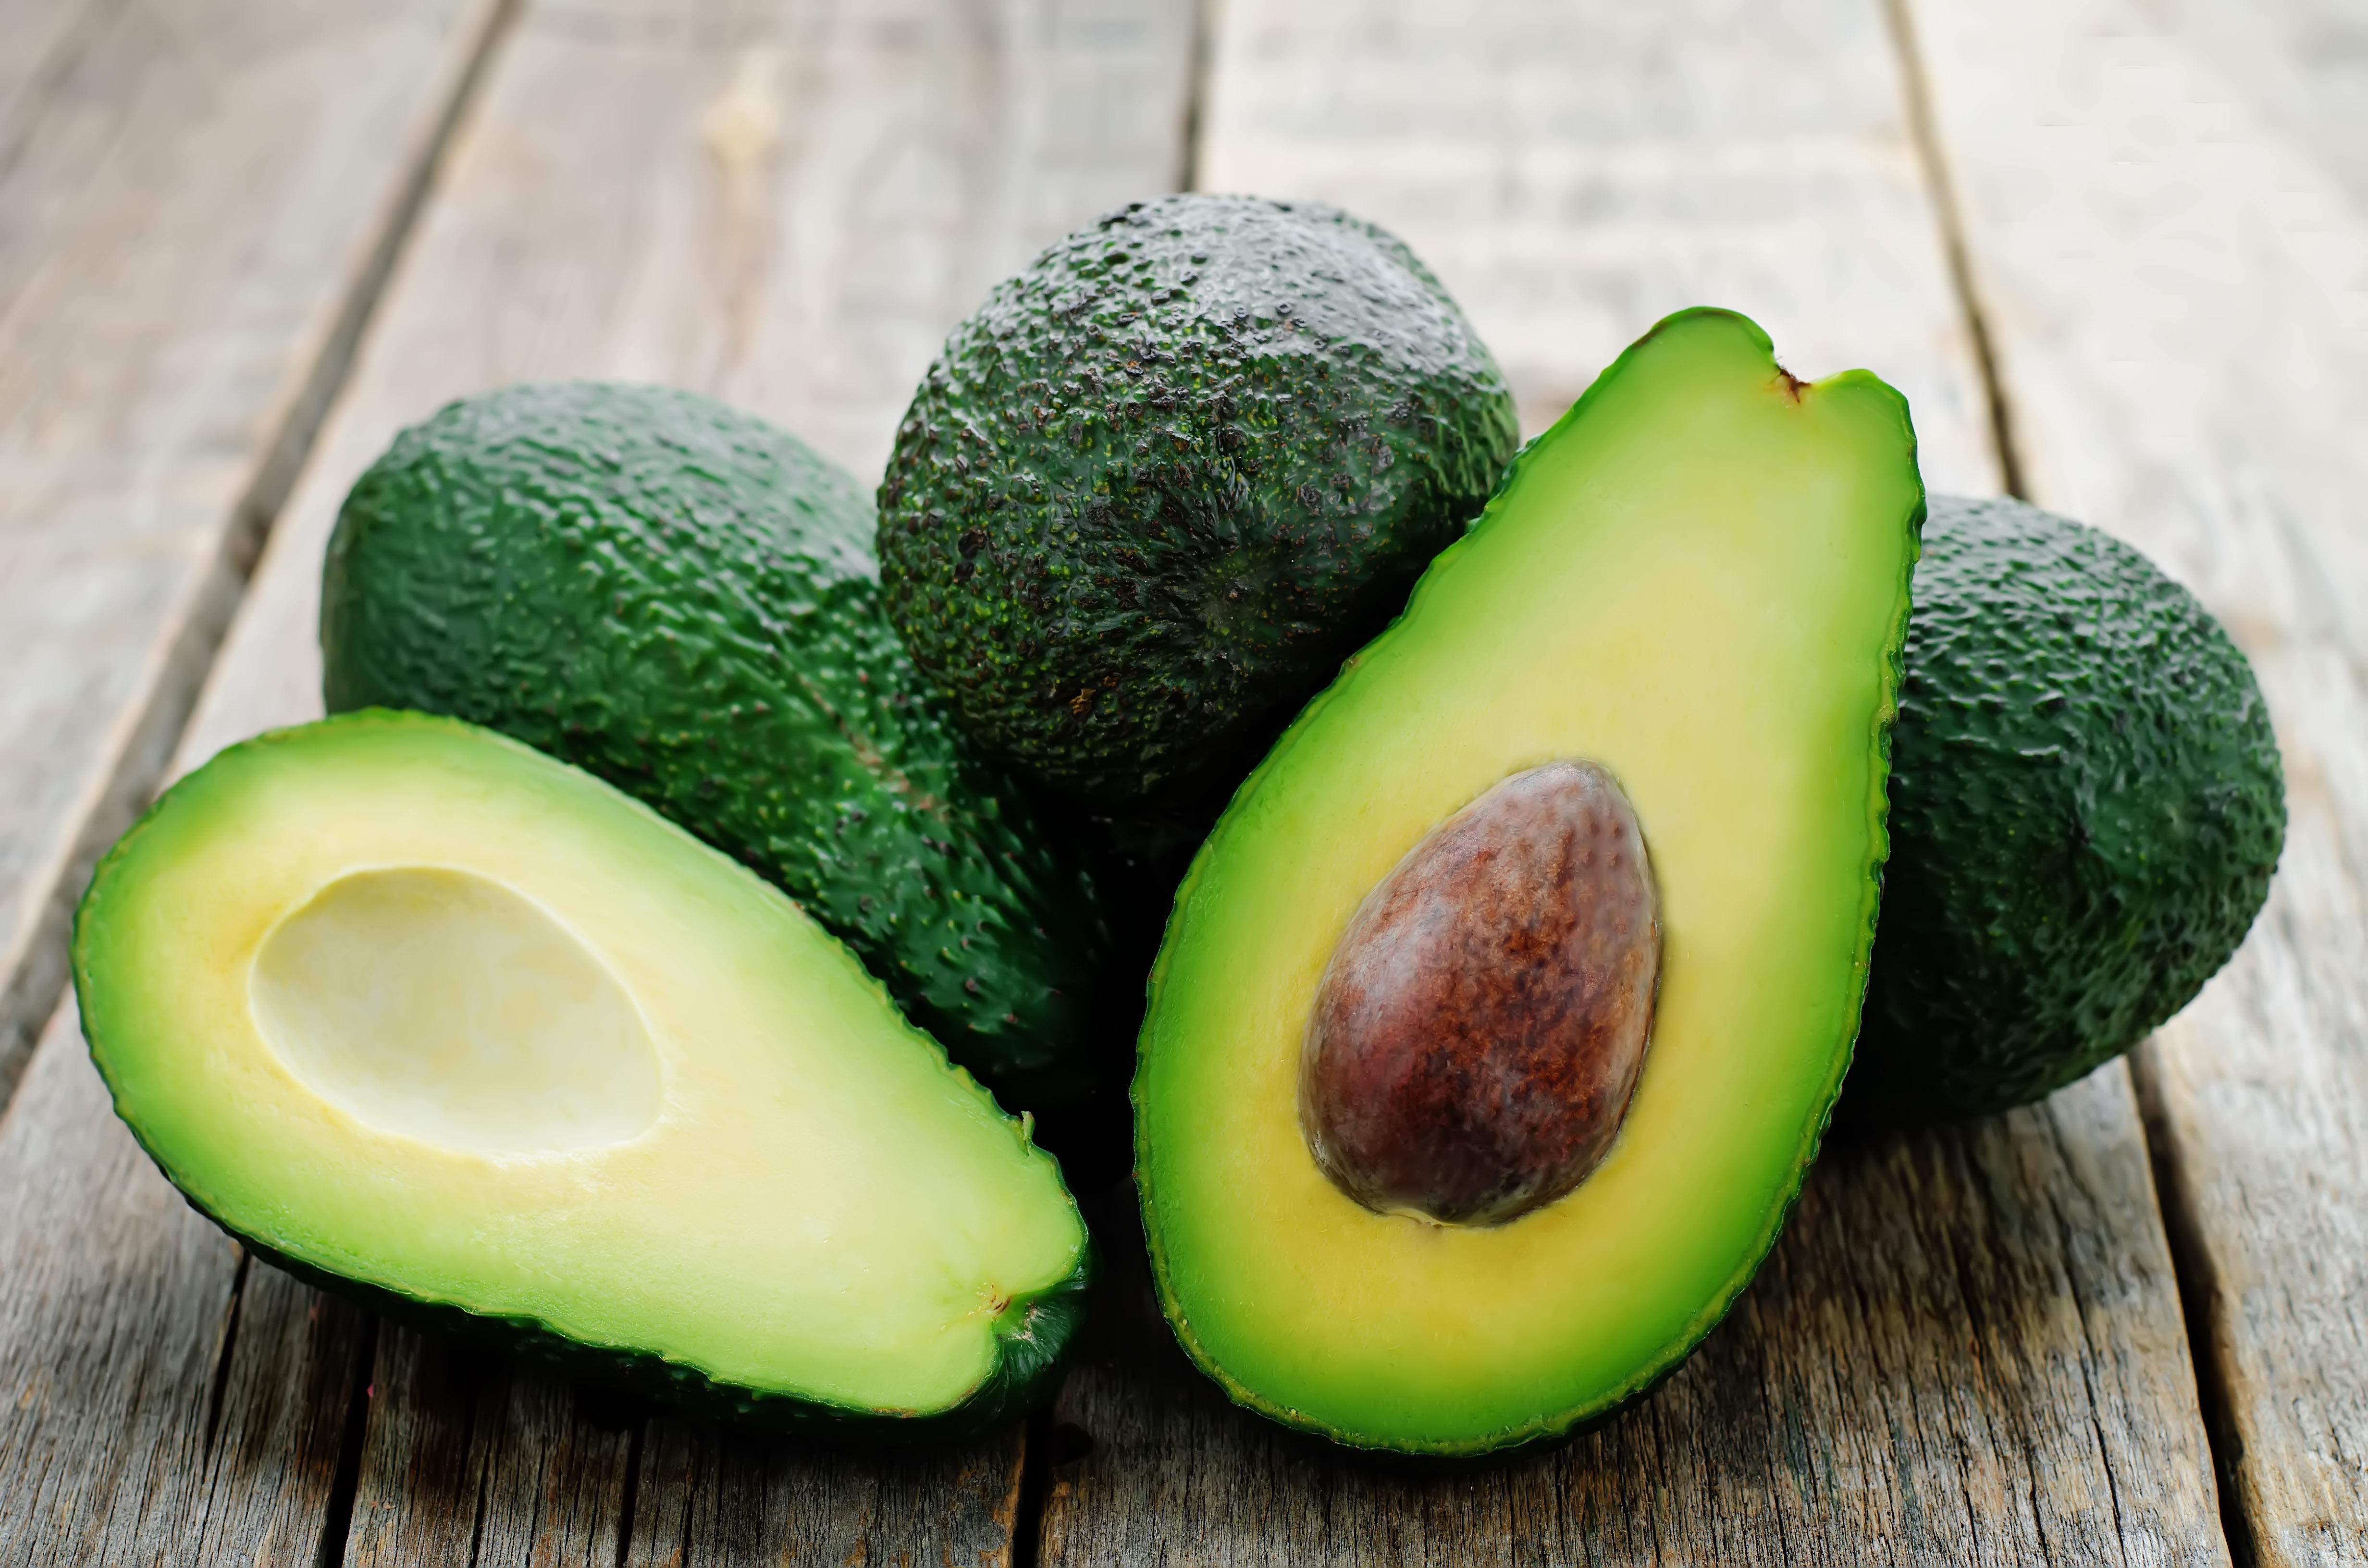 theepochtimes.com - Jack Phillips - FDA: Avocados Recalled Over Listeria Concerns